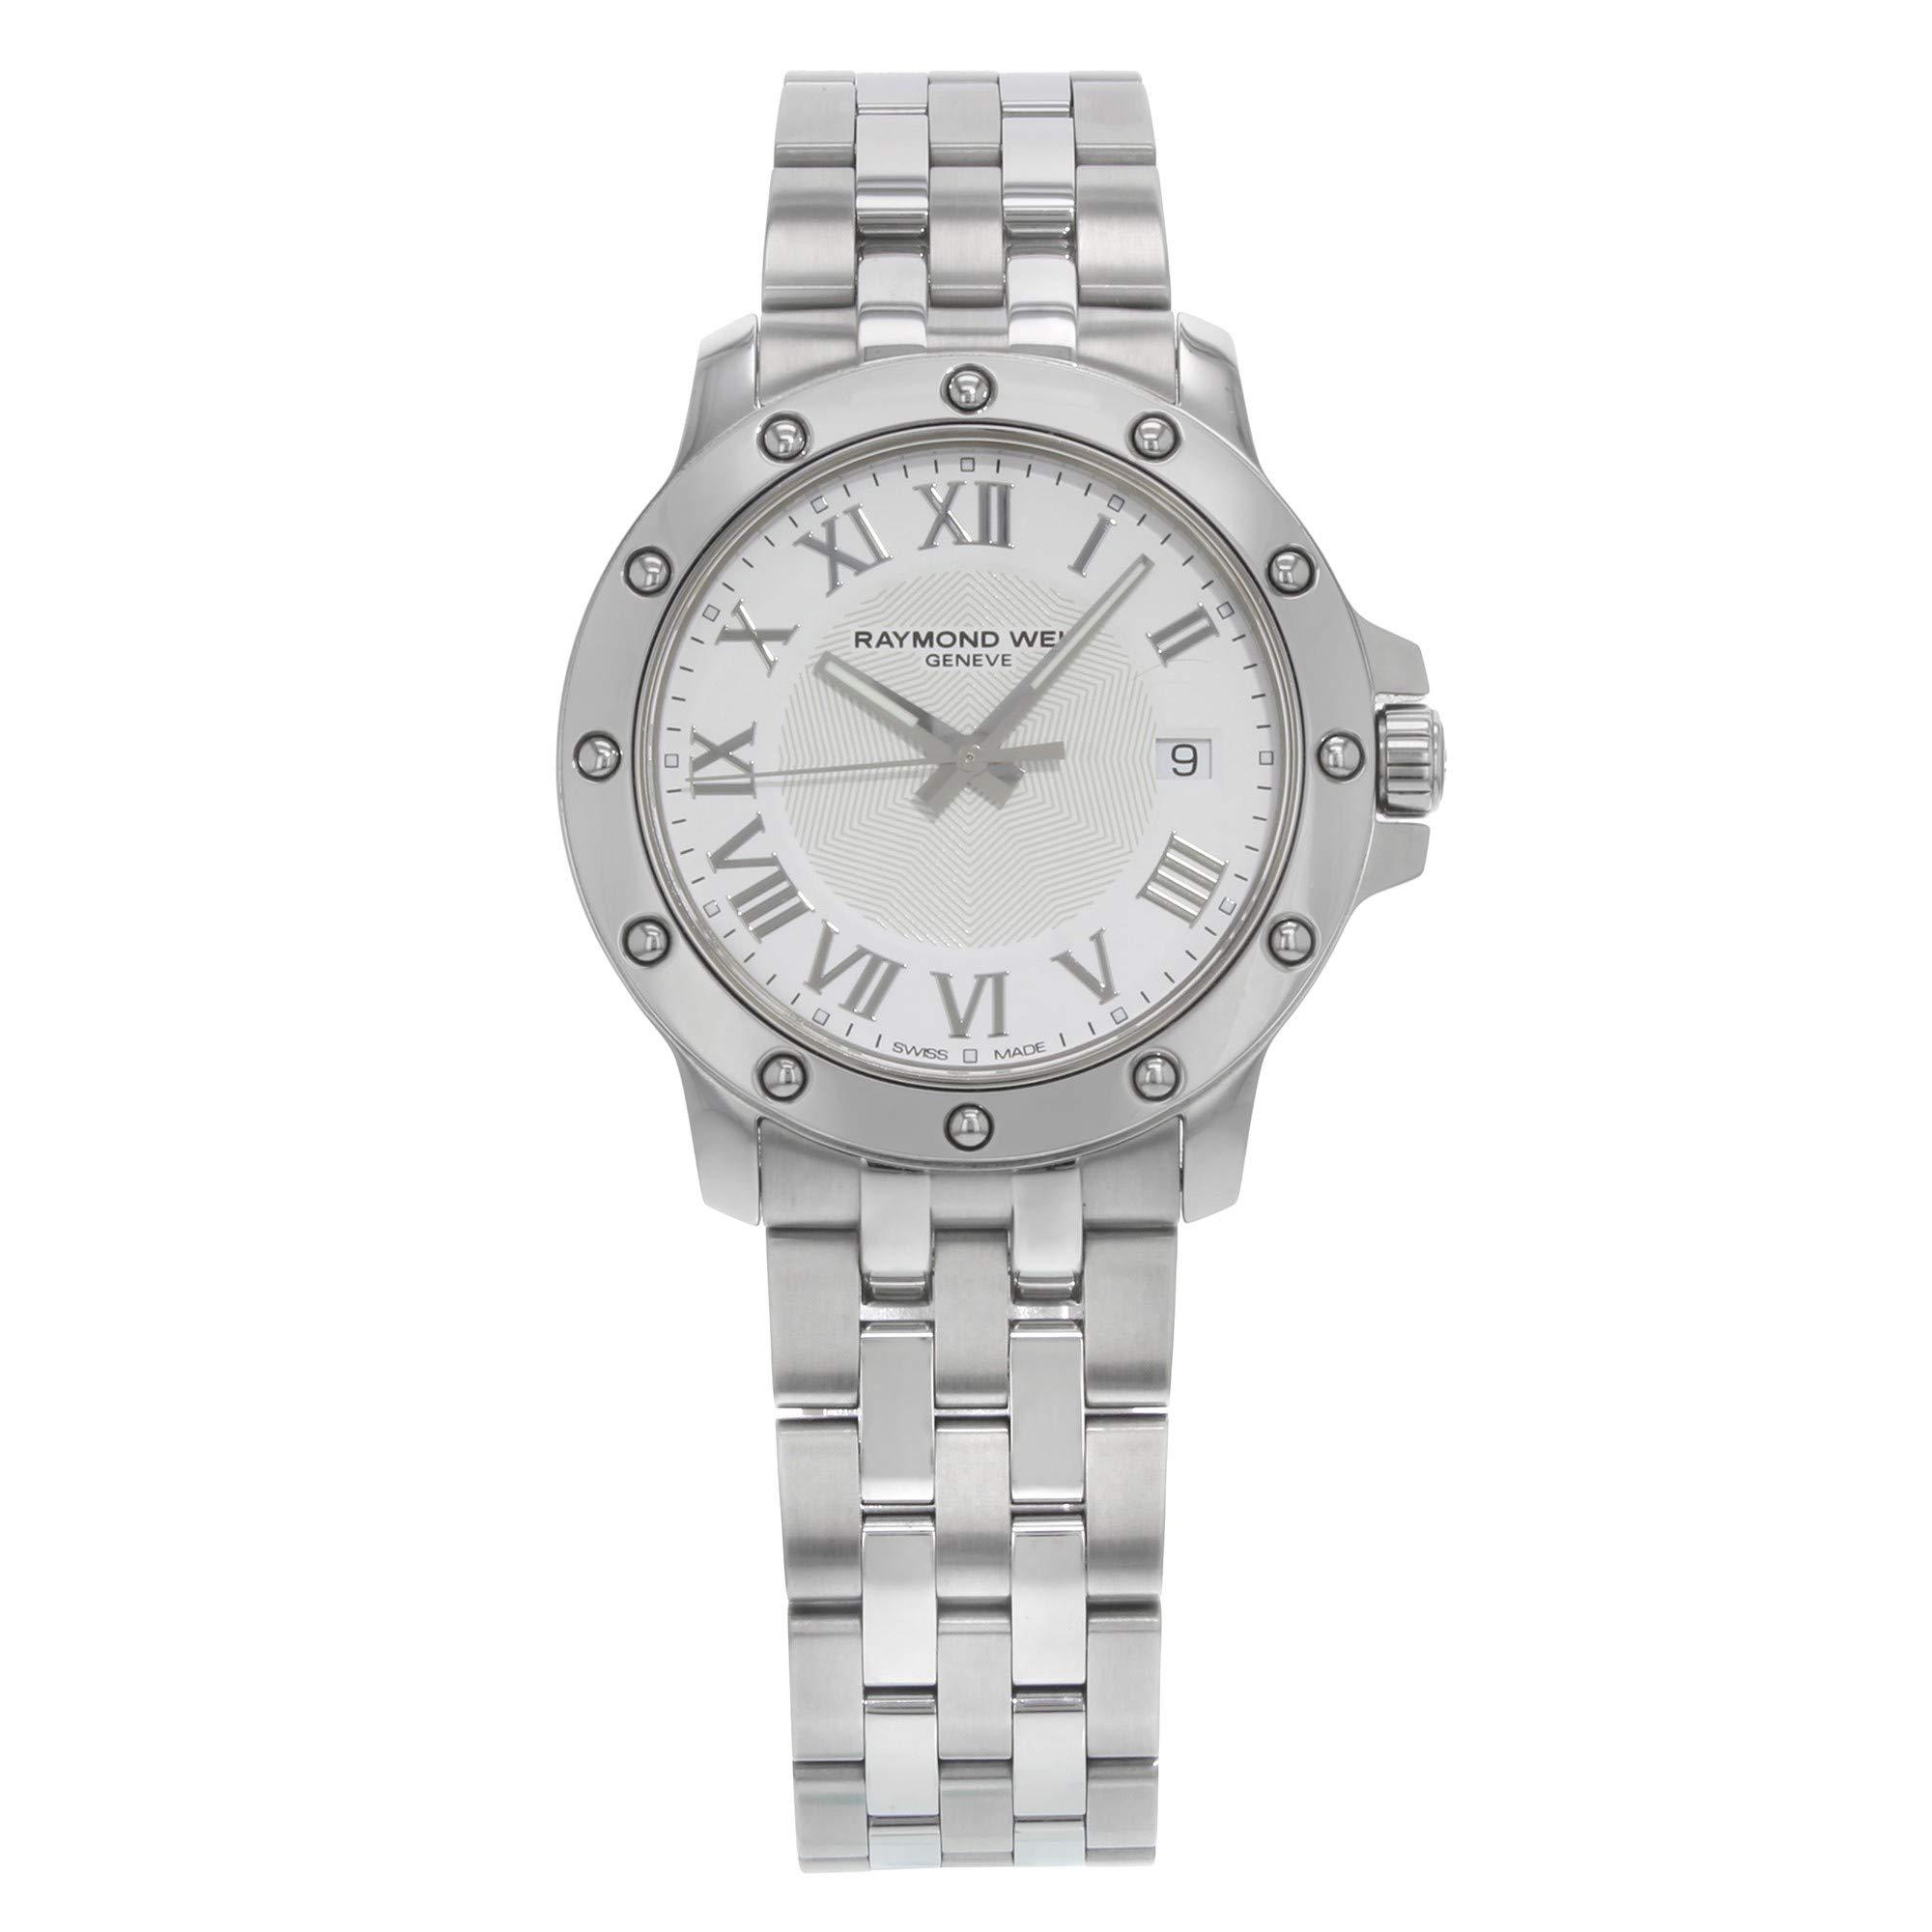 Raymond Weil Tango Quartz Male Watch 5599-ST-00308 (Certified Pre-Owned)